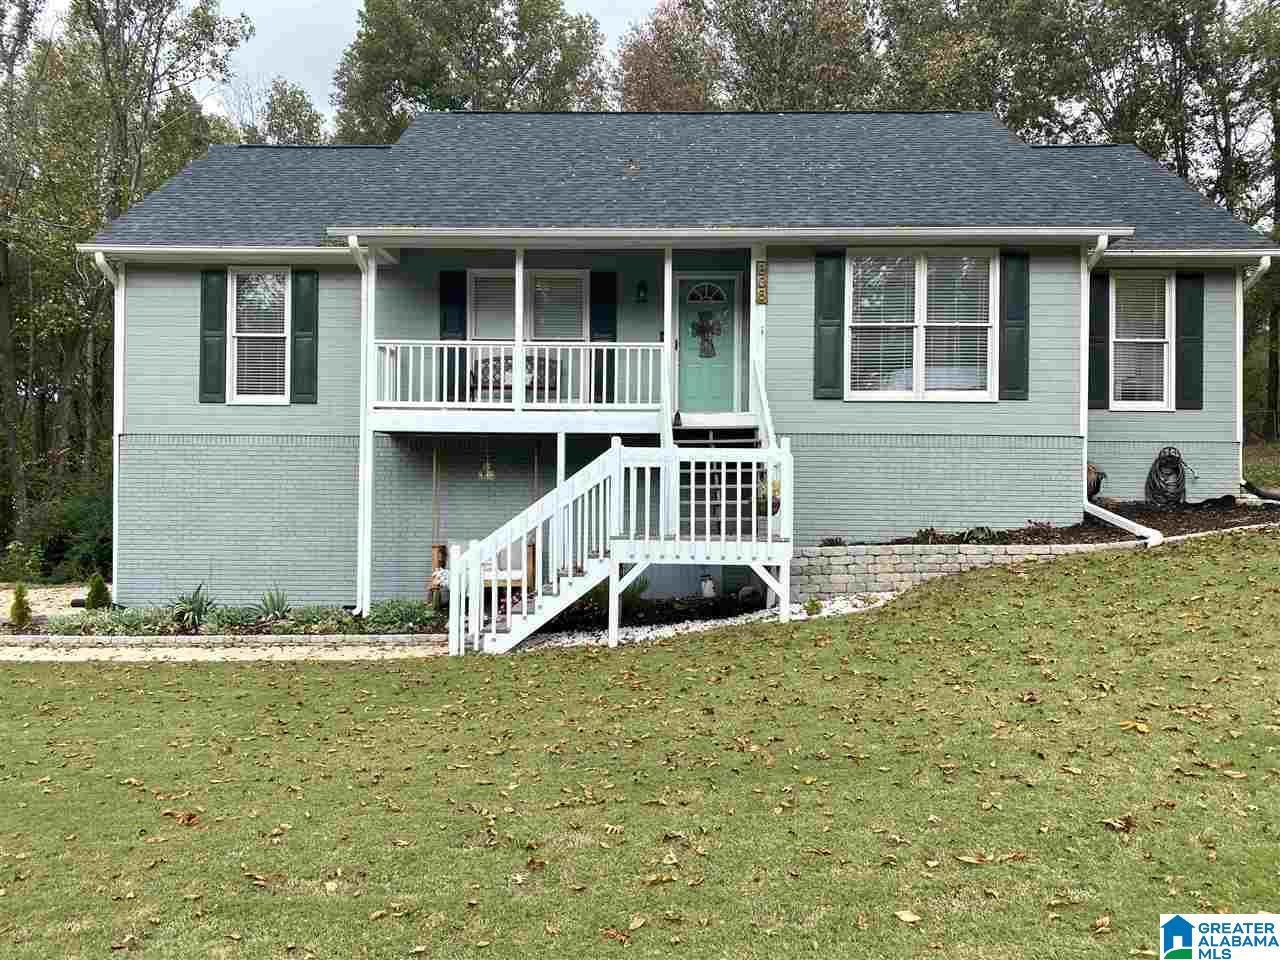 308 LEIGH CIR, Gardendale, AL 35071 - MLS#: 900734